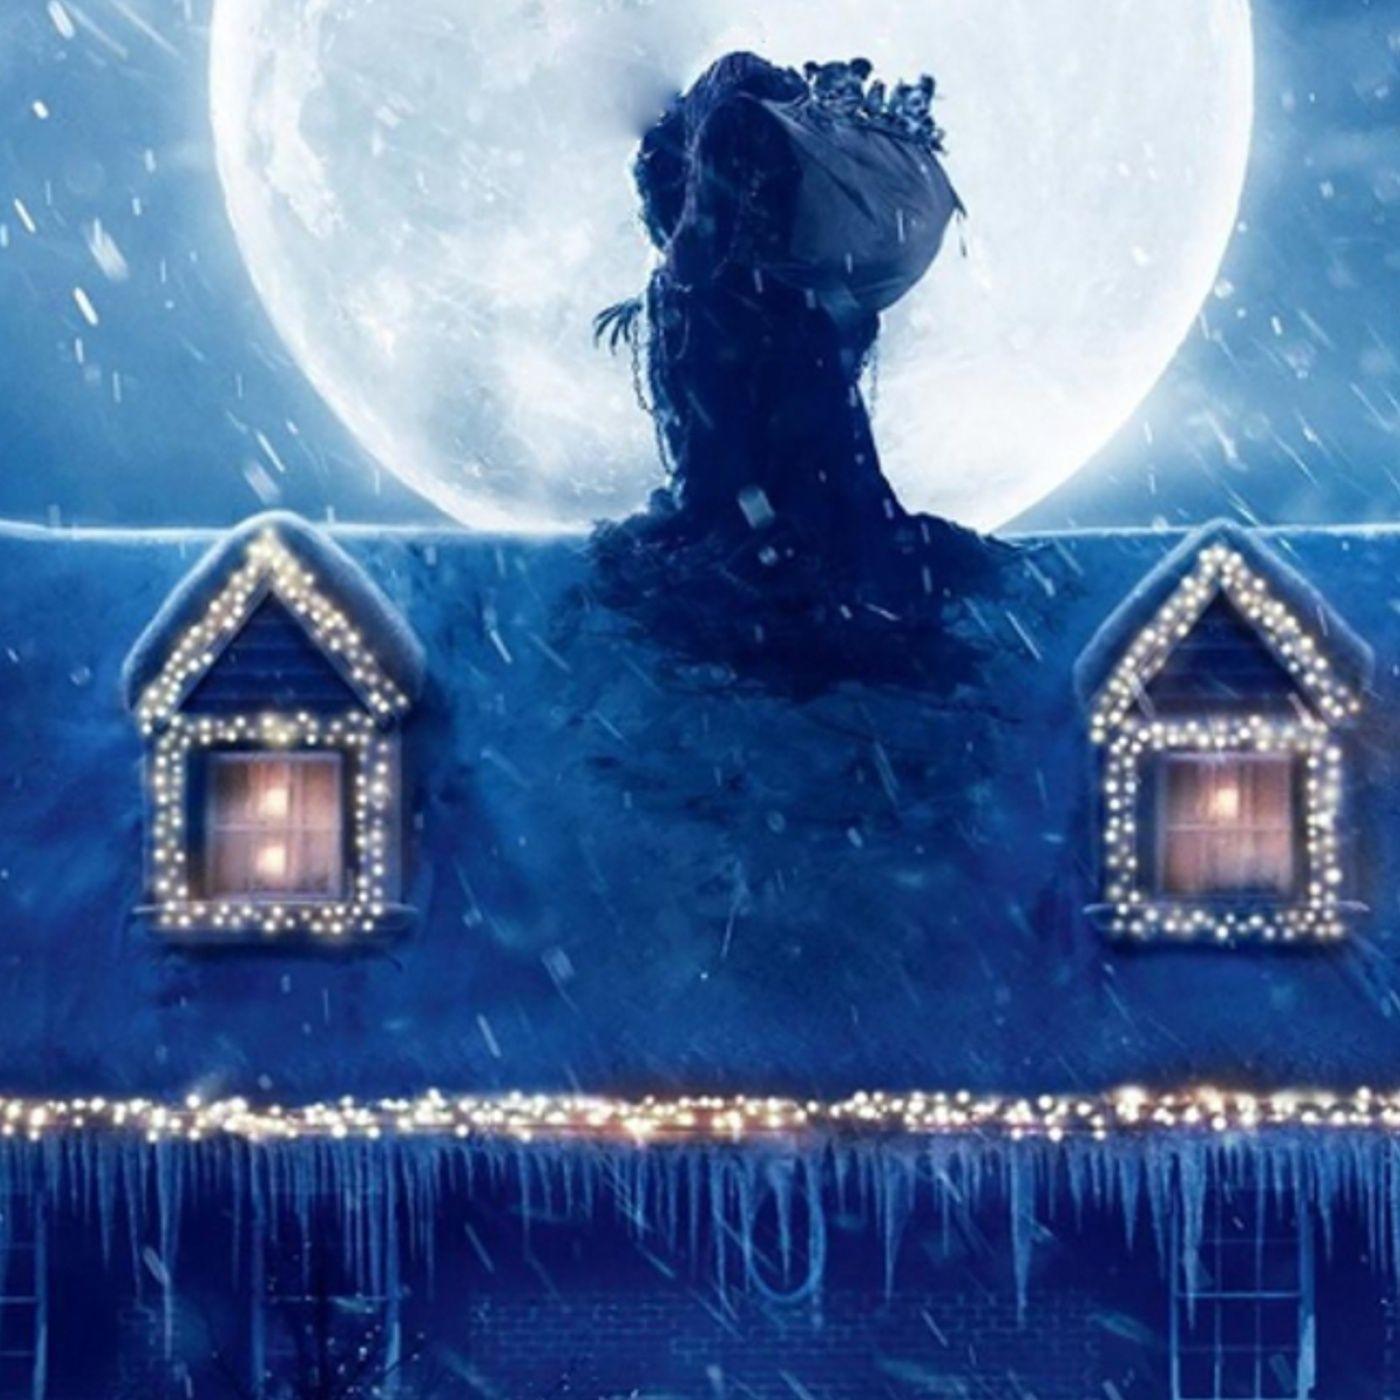 #audiostoria - Scary Christmas